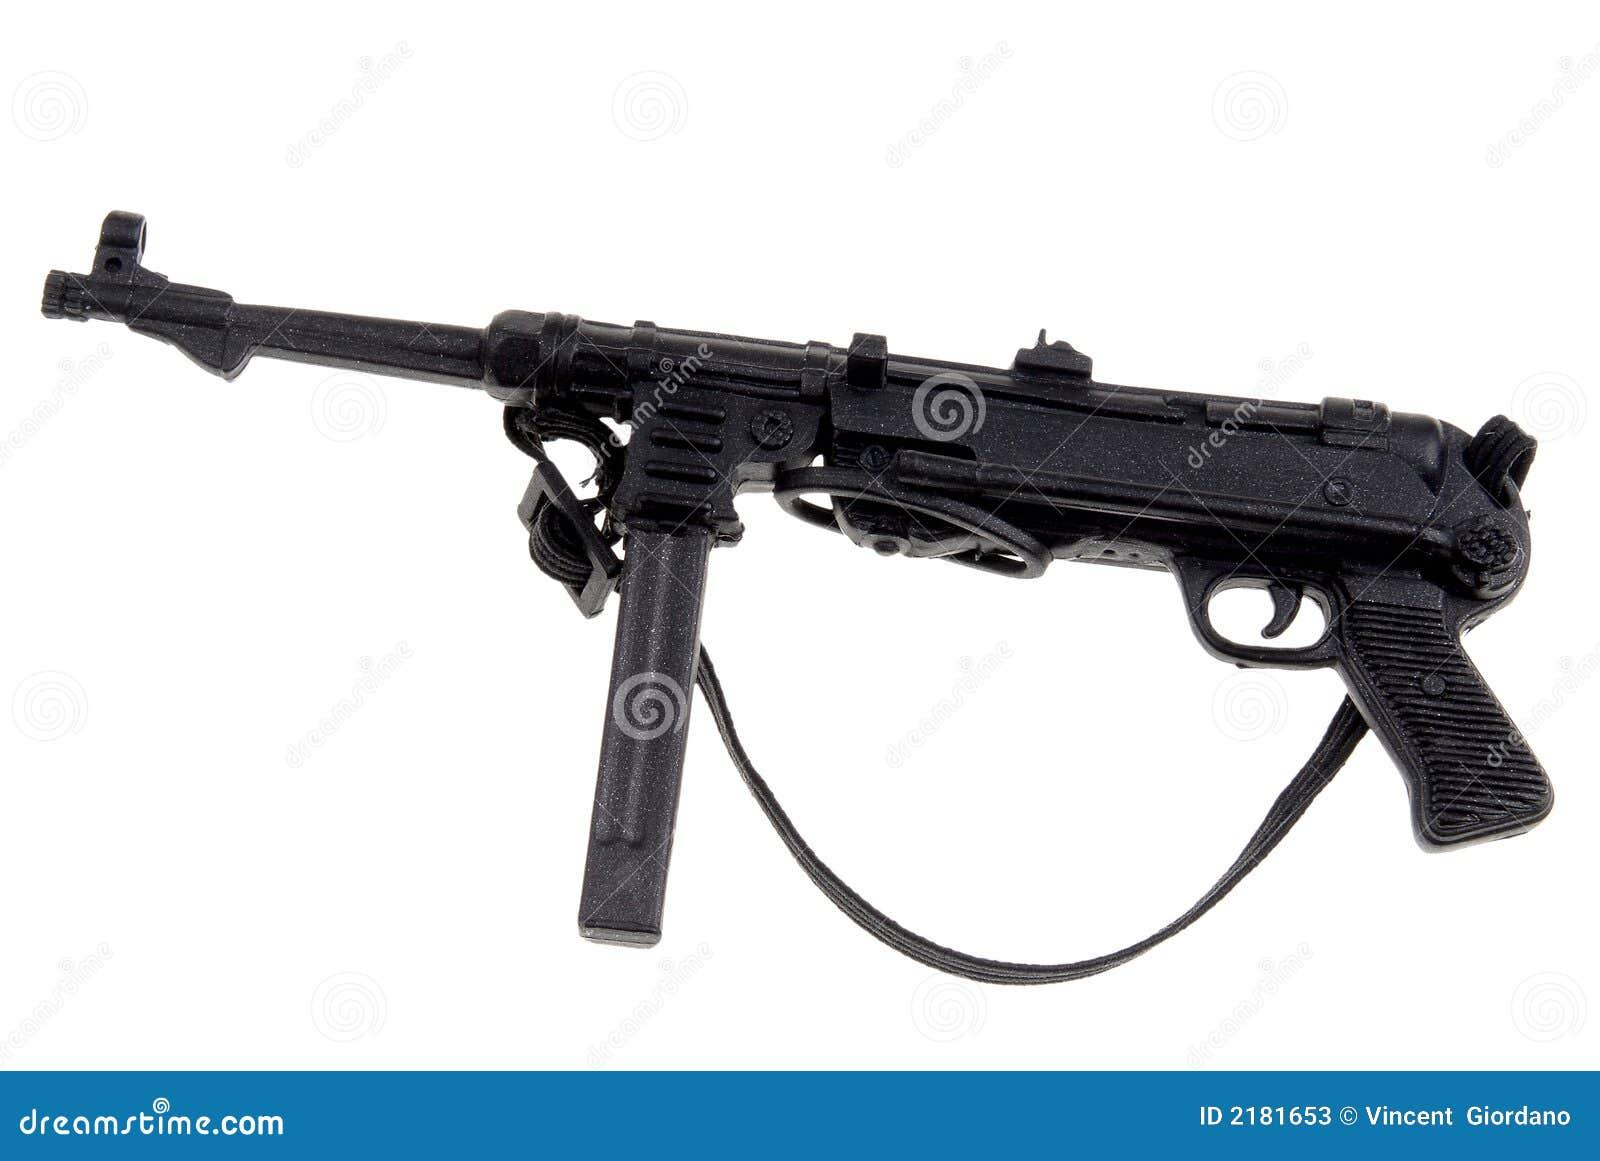 German Ww2 Machine Guns Toy german machine gun